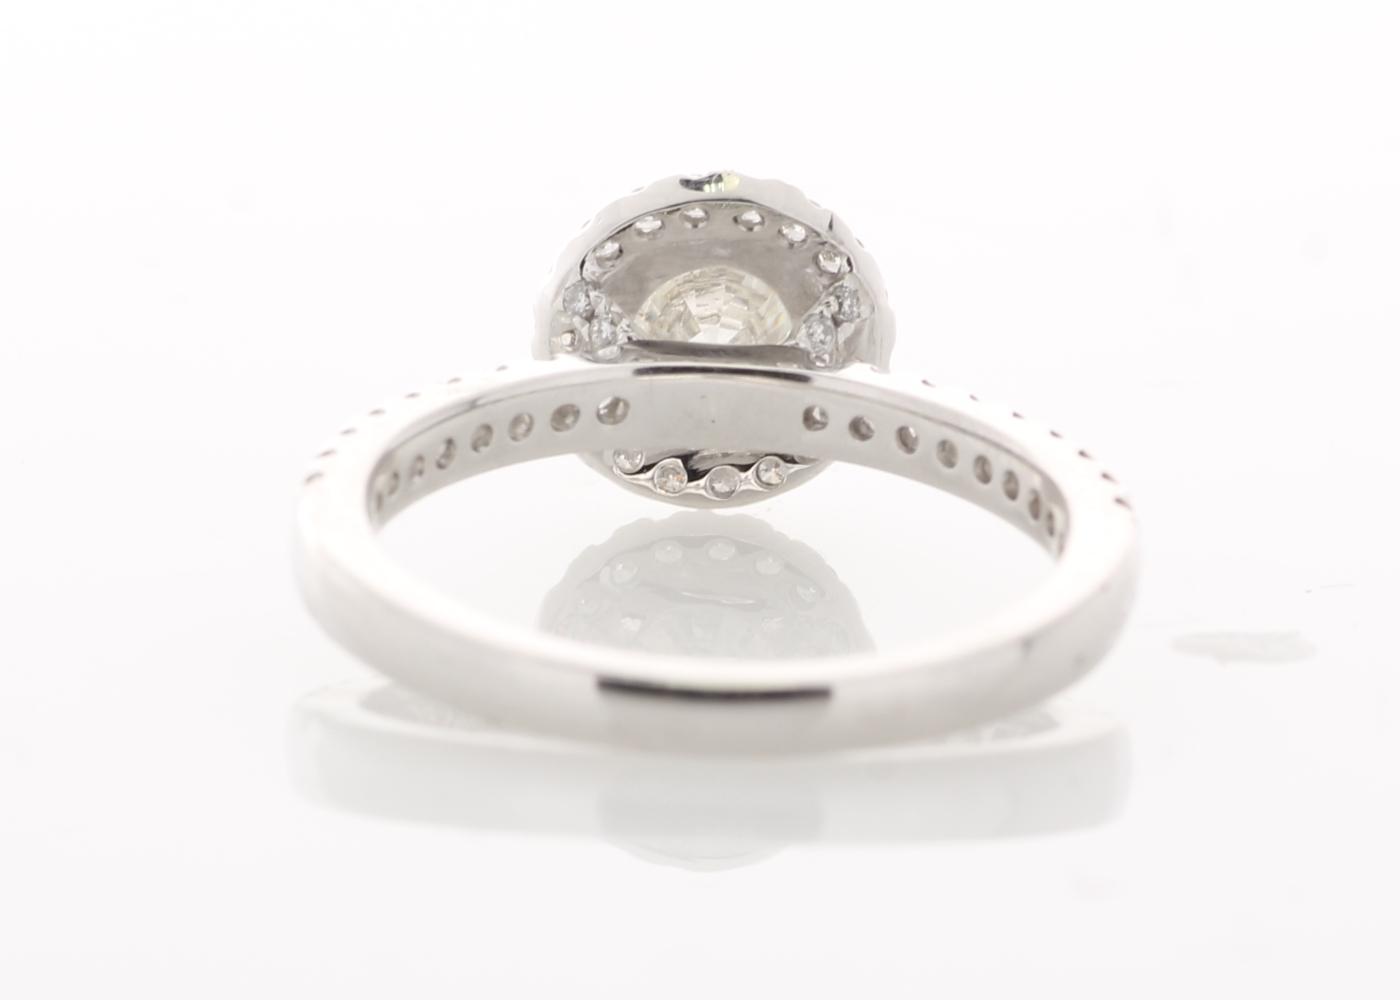 18ct White Gold Halo Set Ring 1.37 Carats - Image 3 of 5